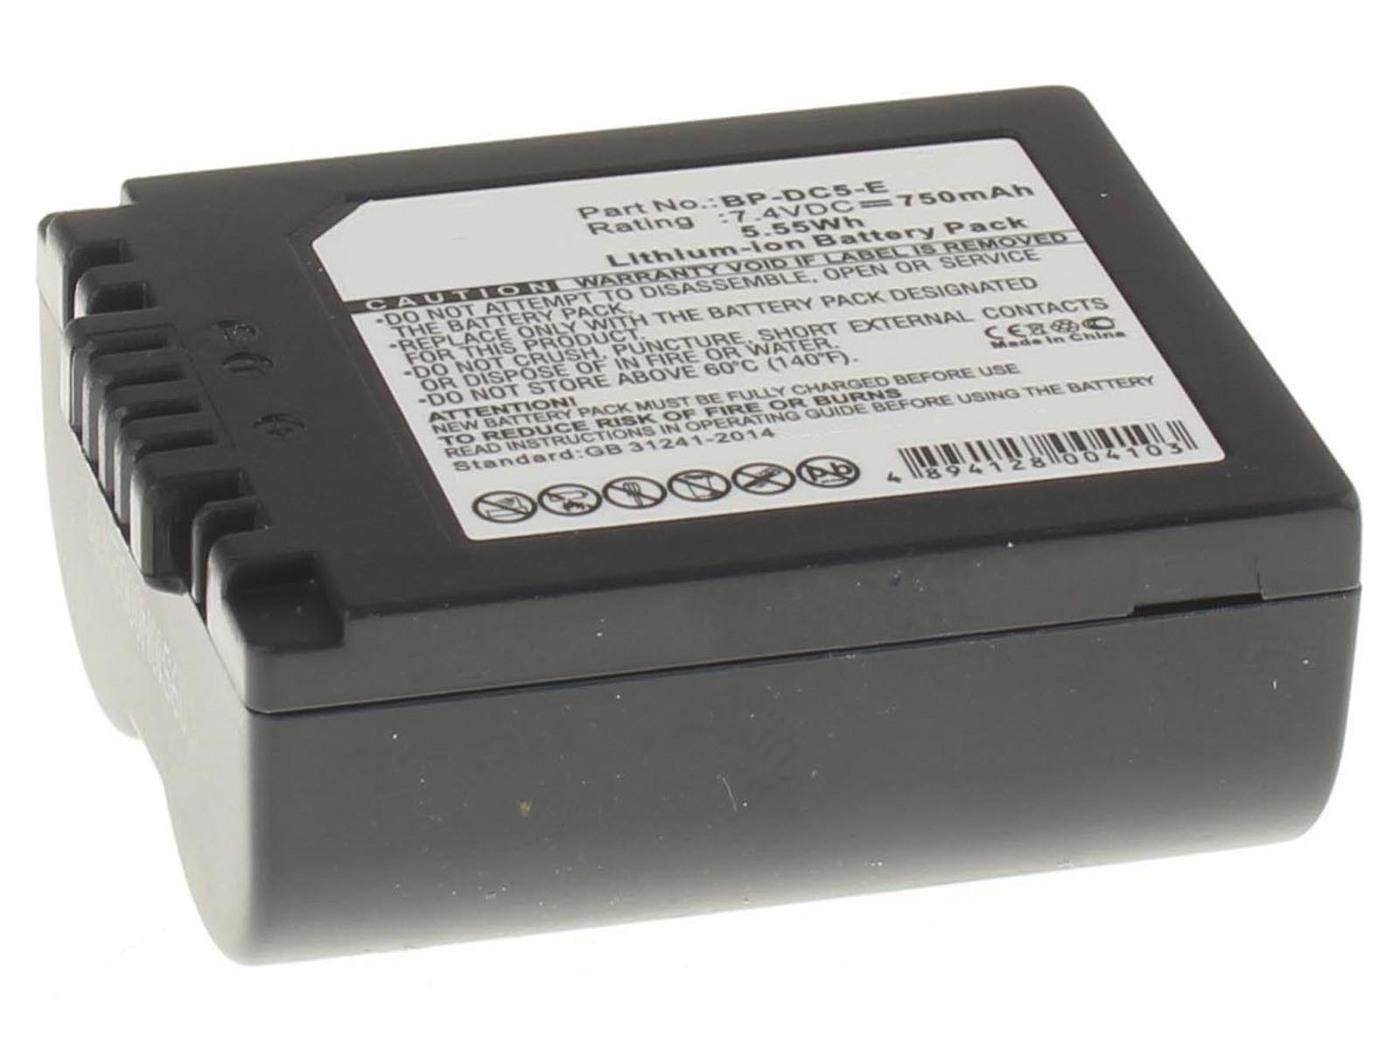 Аккумуляторная батарея iBatt iB-T1-F318 750mAh для камер Leica V-Lux 1,  для Panasonic Lumix DMC-FZ8, Lumix DMC-FZ50, Lumix DMC-FZ18, Lumix DMC-FZ7, Lumix DMC-FZ38, Lumix DMC-FZ30, Lumix DMC-FZ28, Lumix DMC-FZ35,